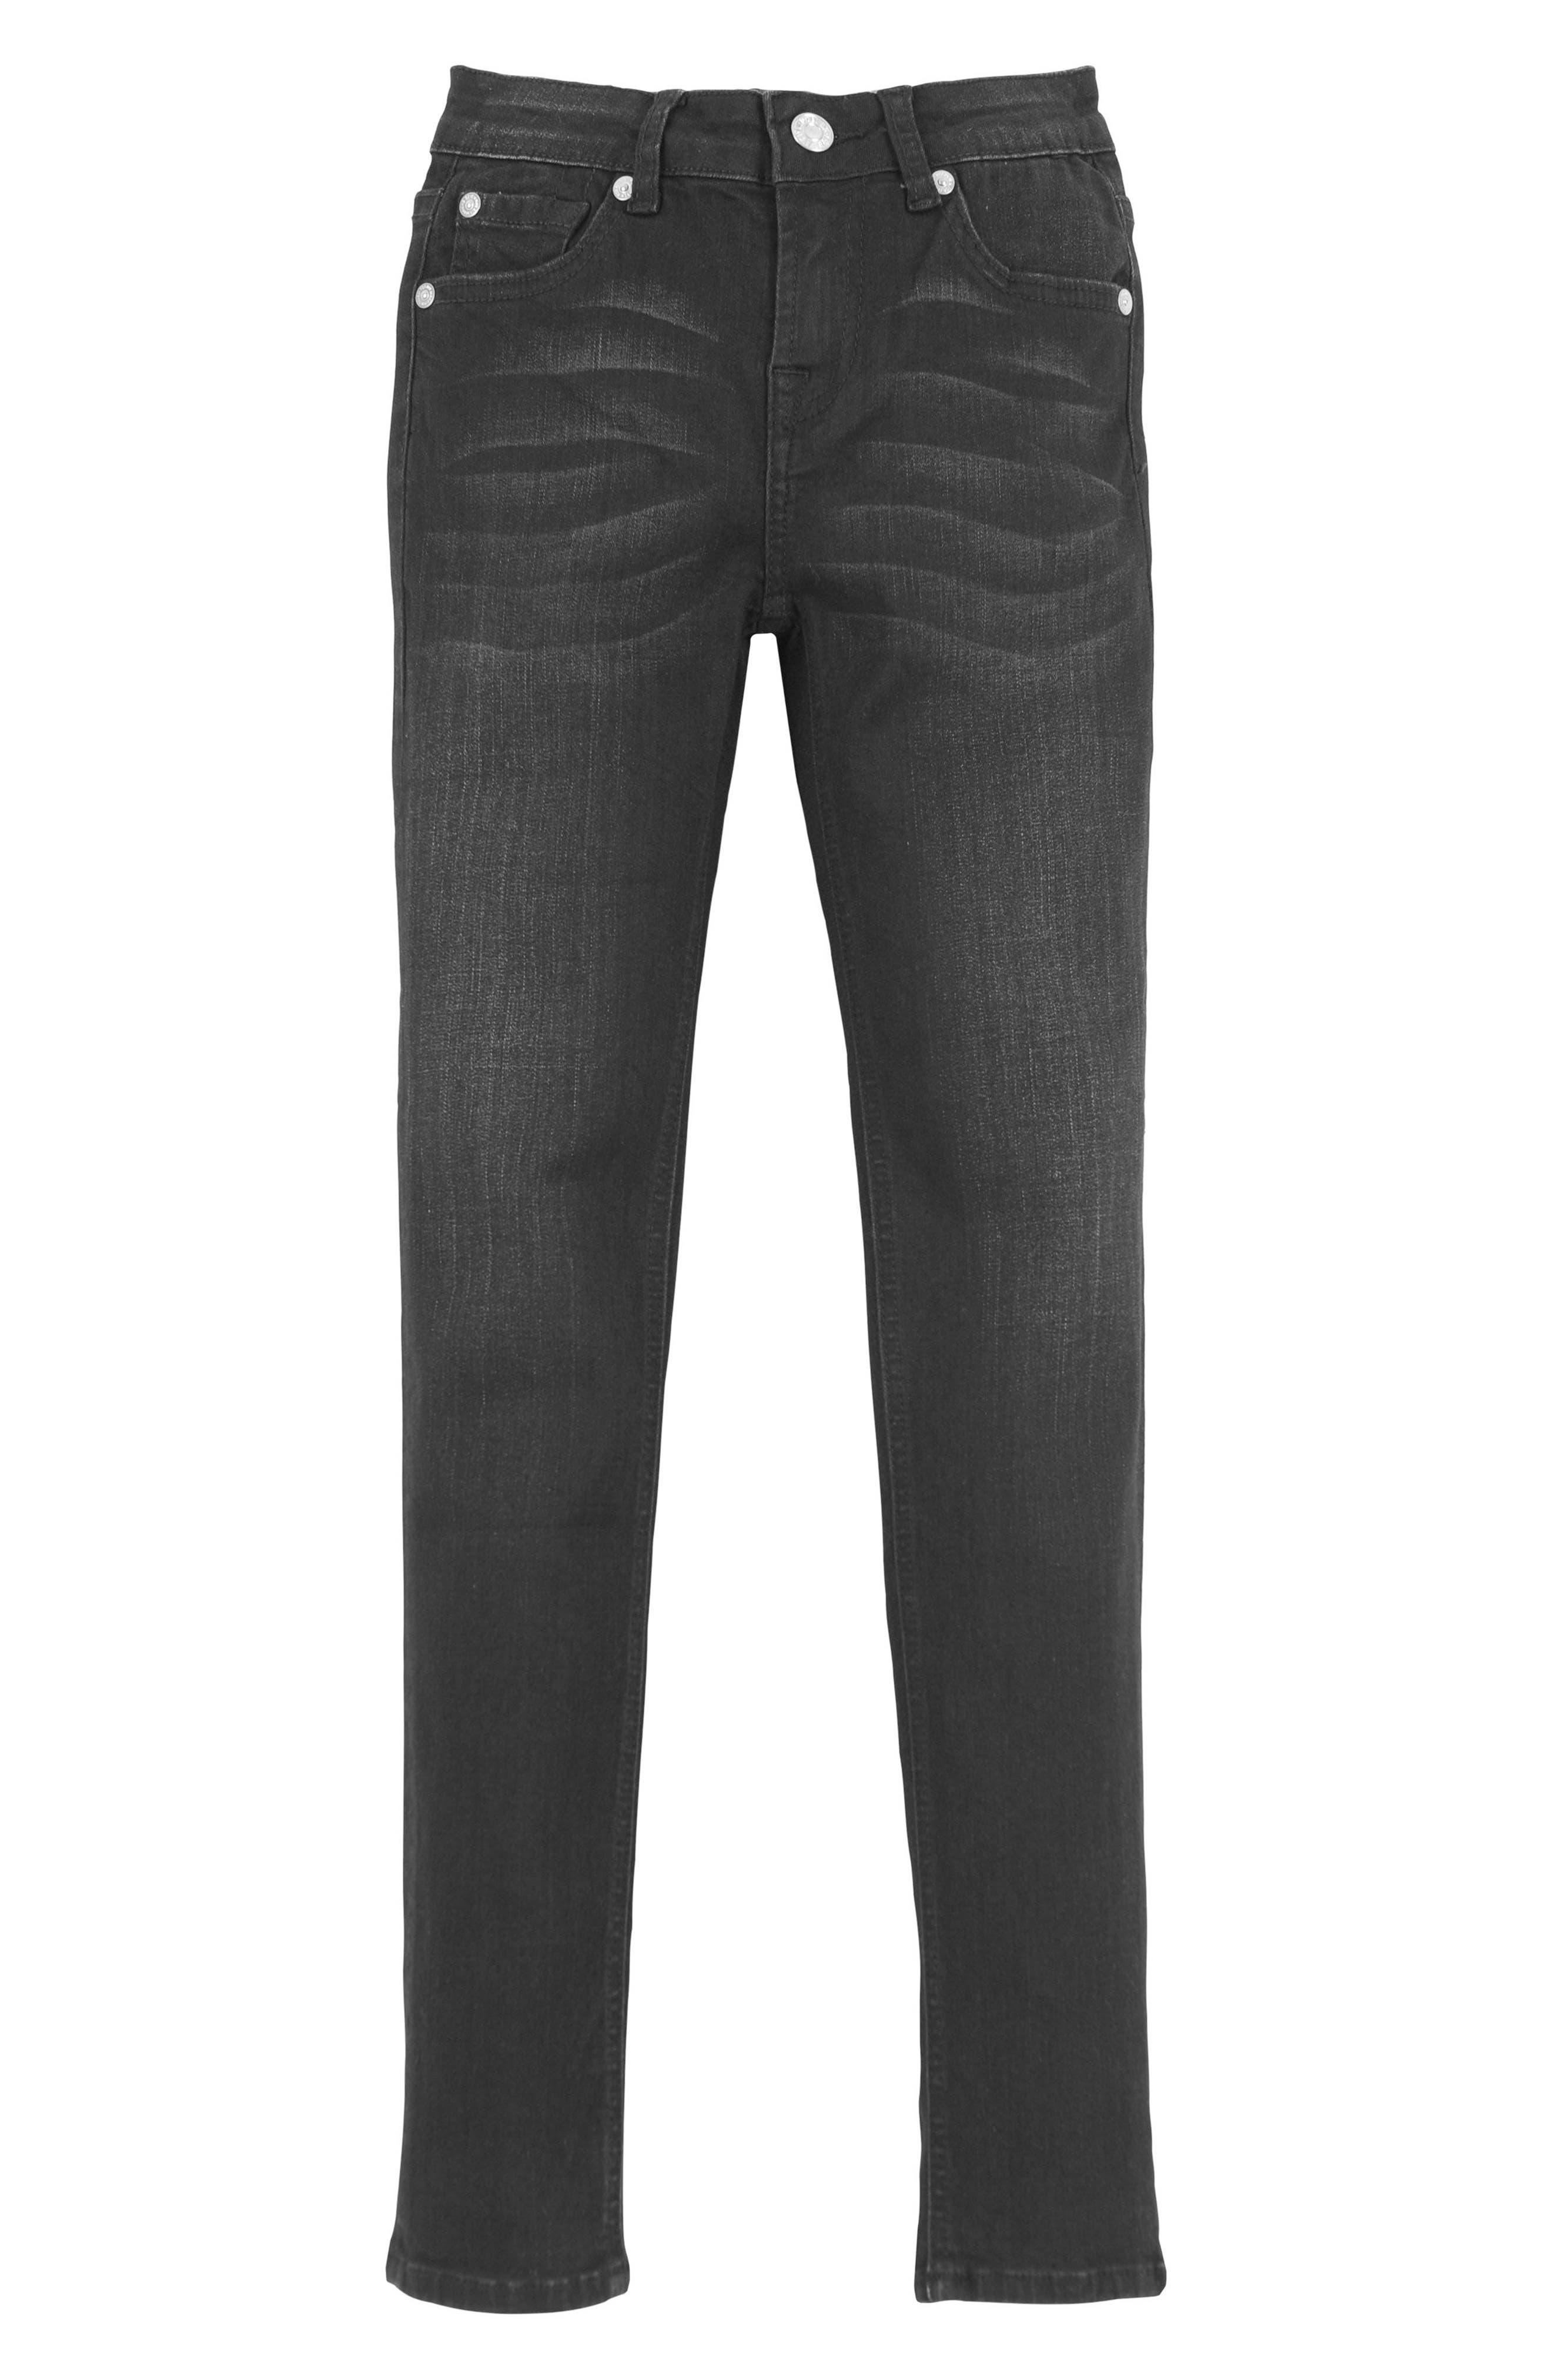 Slimmy Slim Fit Jeans,                         Main,                         color, 025